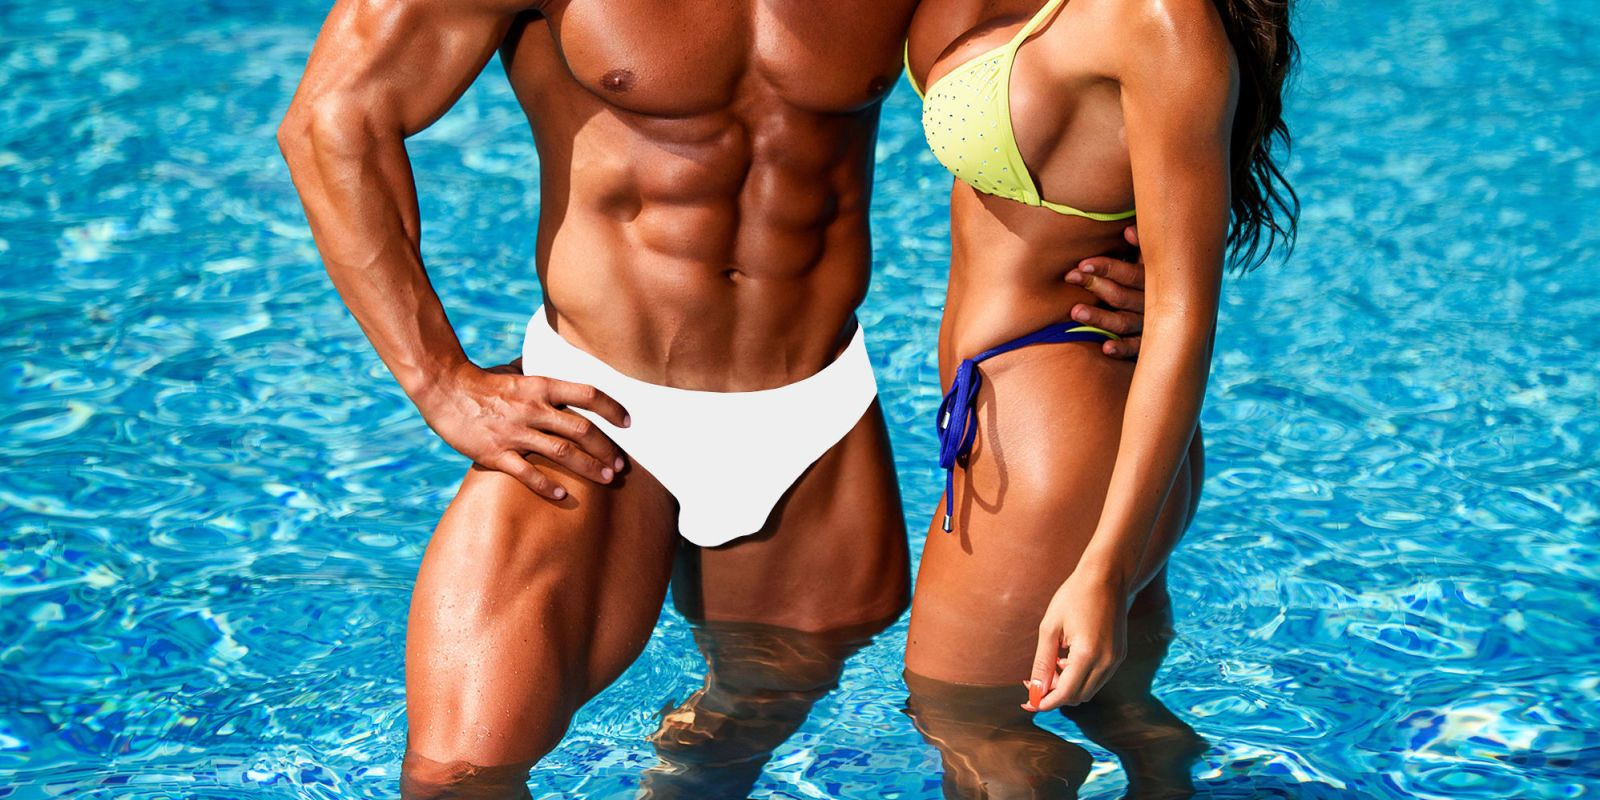 straight bloke dressing in bikini bottom